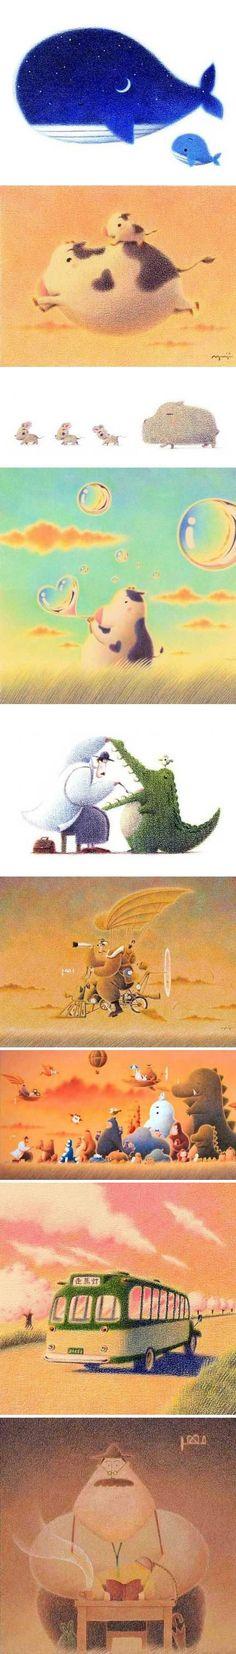 日本插画师Yuji Hasegawa。: